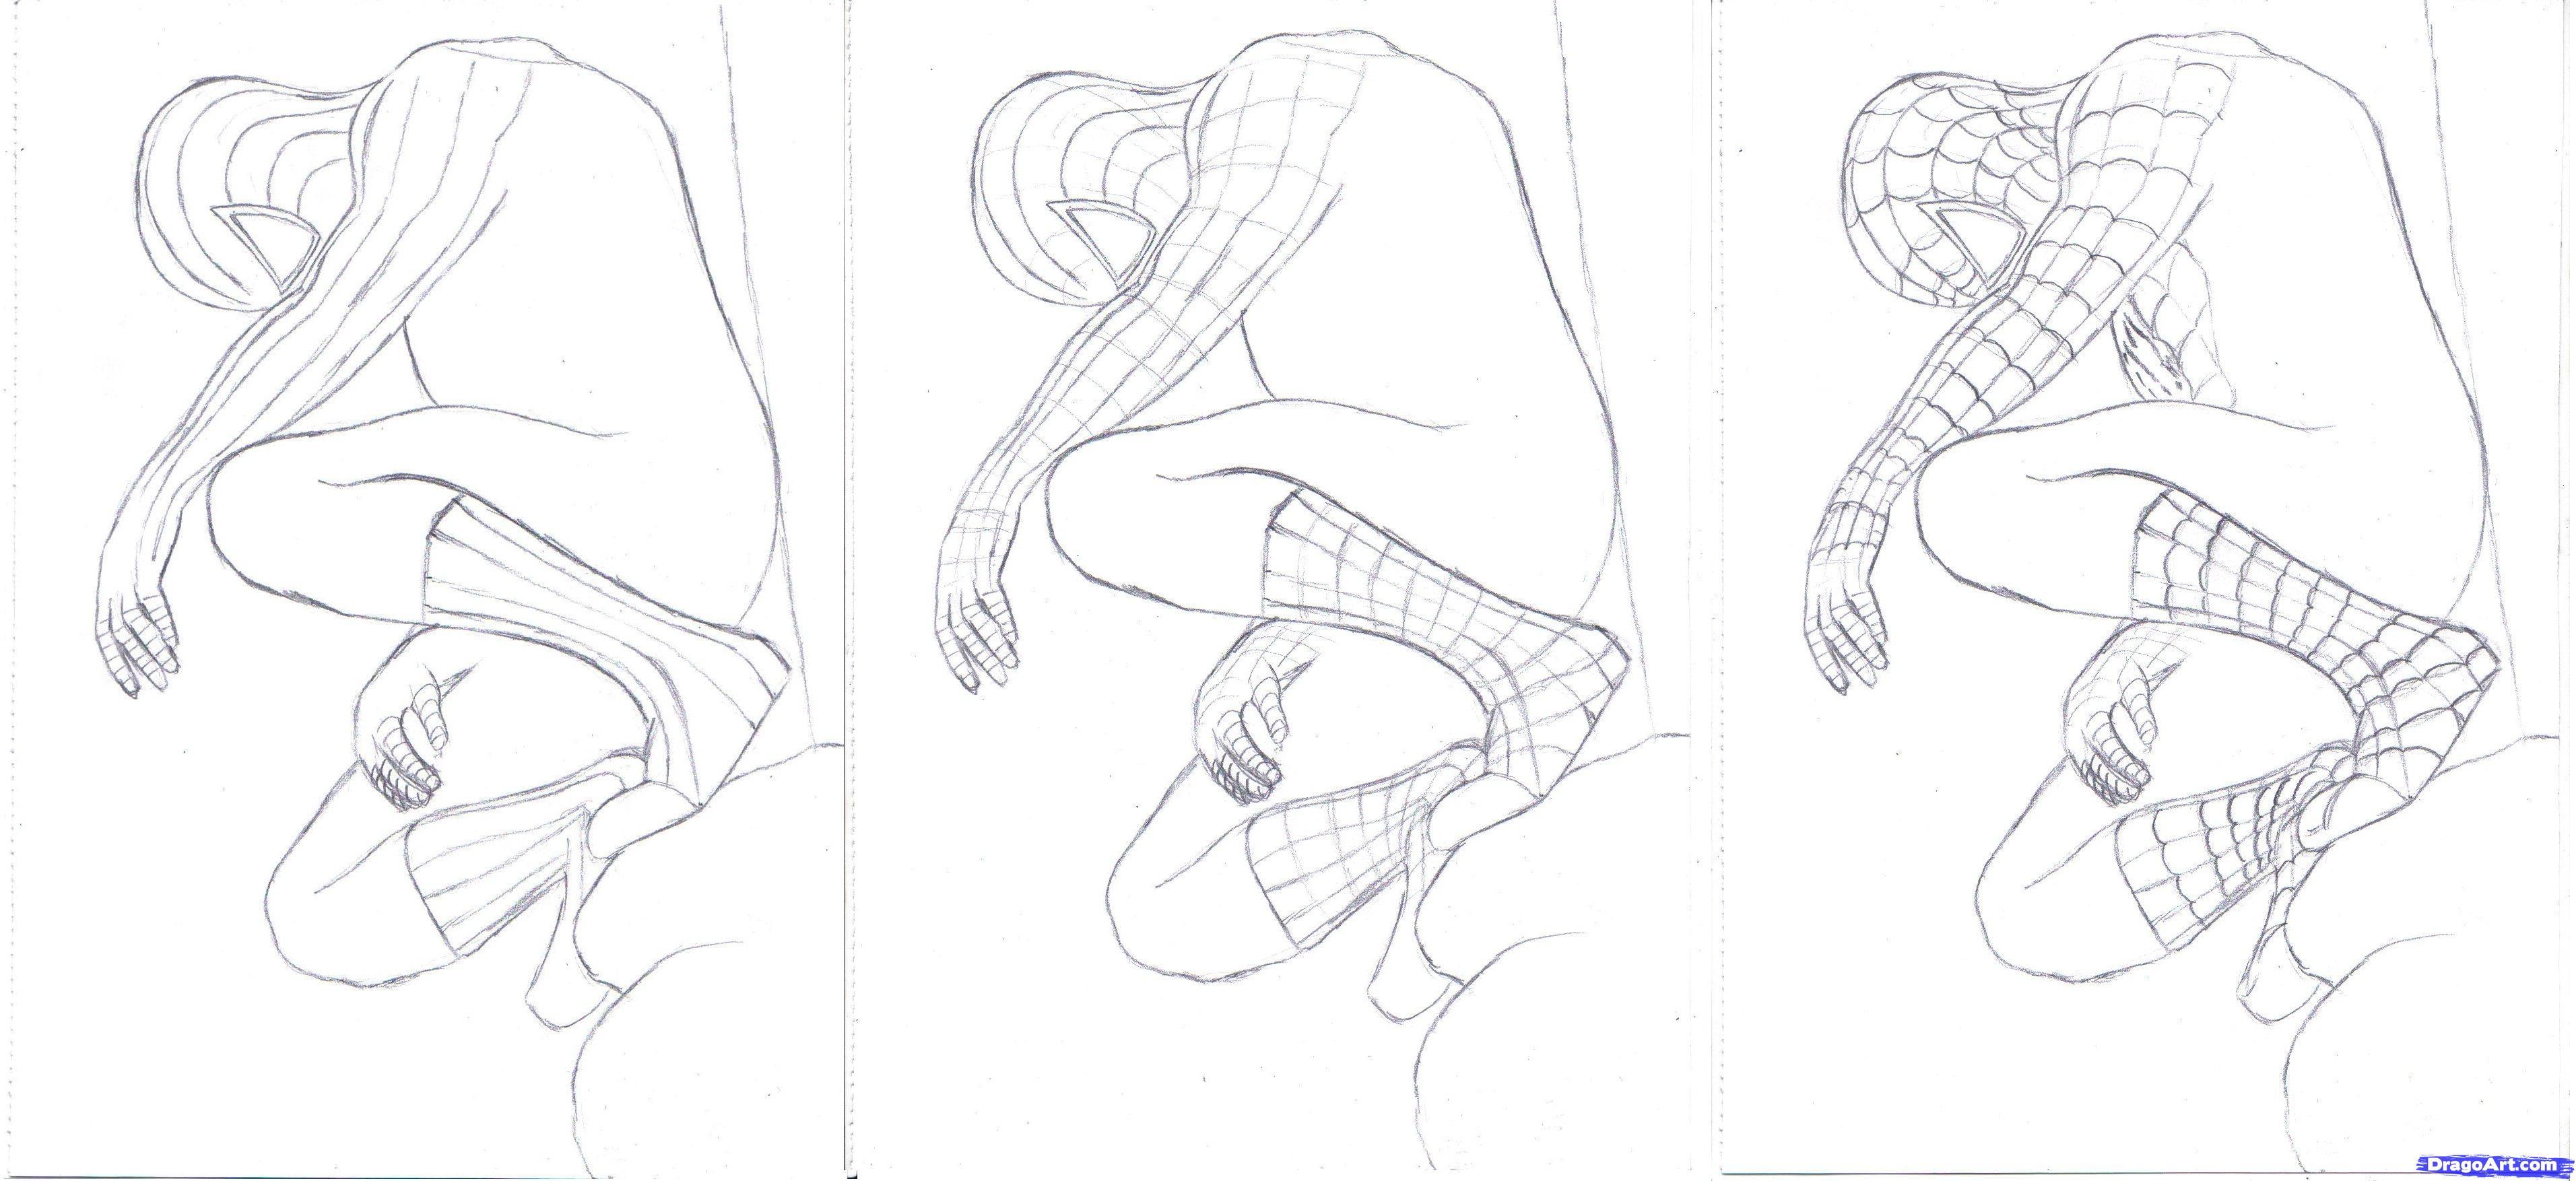 Drawn spiderman step by step Marvel Step Black  to